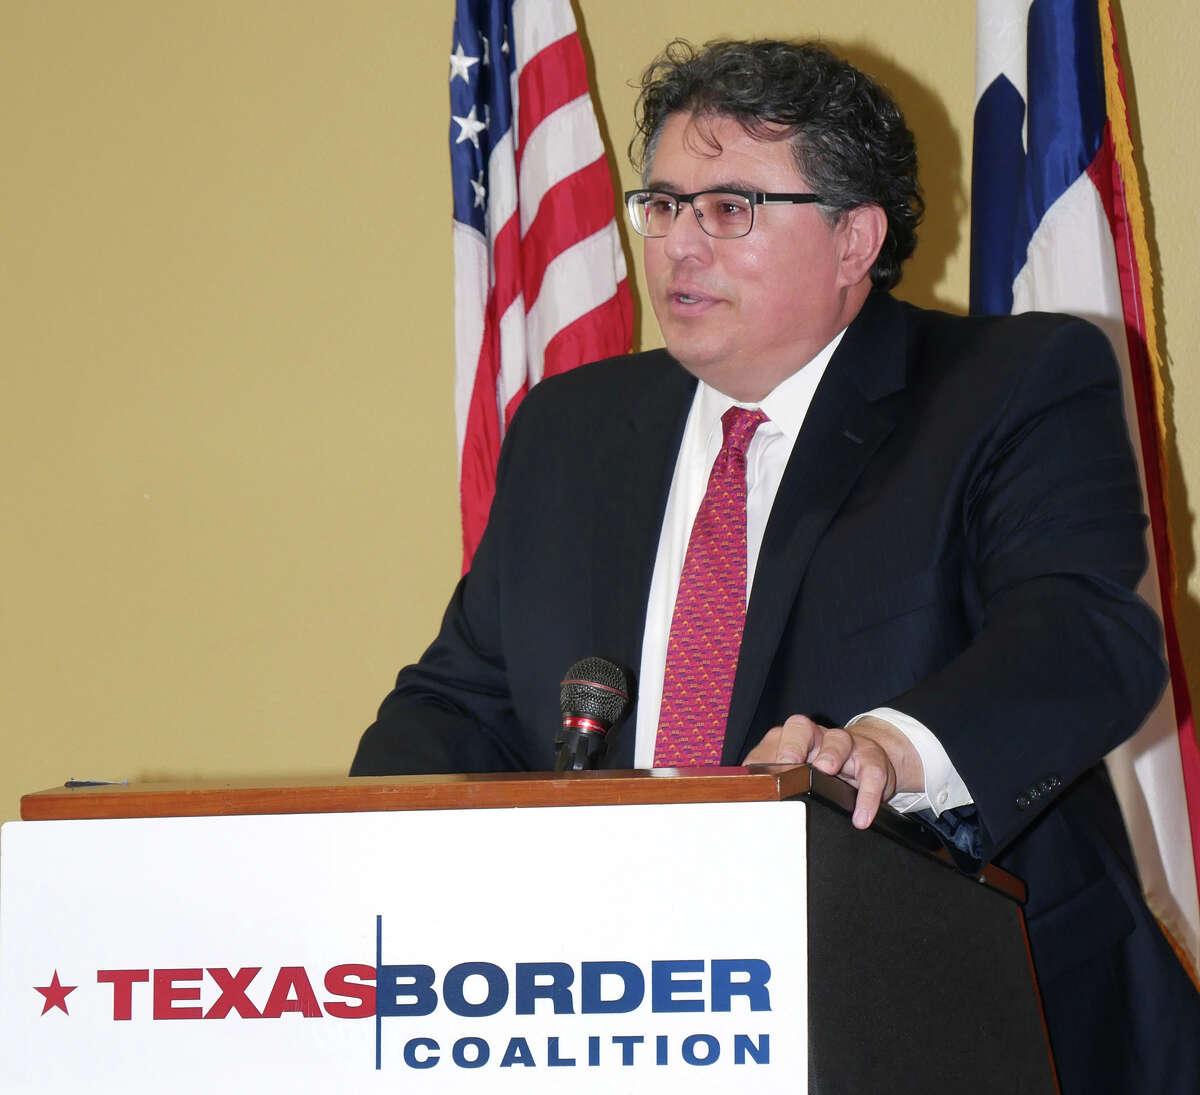 Texas Secretary of State Rolando Pablos was the keynote speaker at the Texas Border Coalition Annual Meeting in Laredo, at La Posada Hotel, Thursday, November 2, 2017.